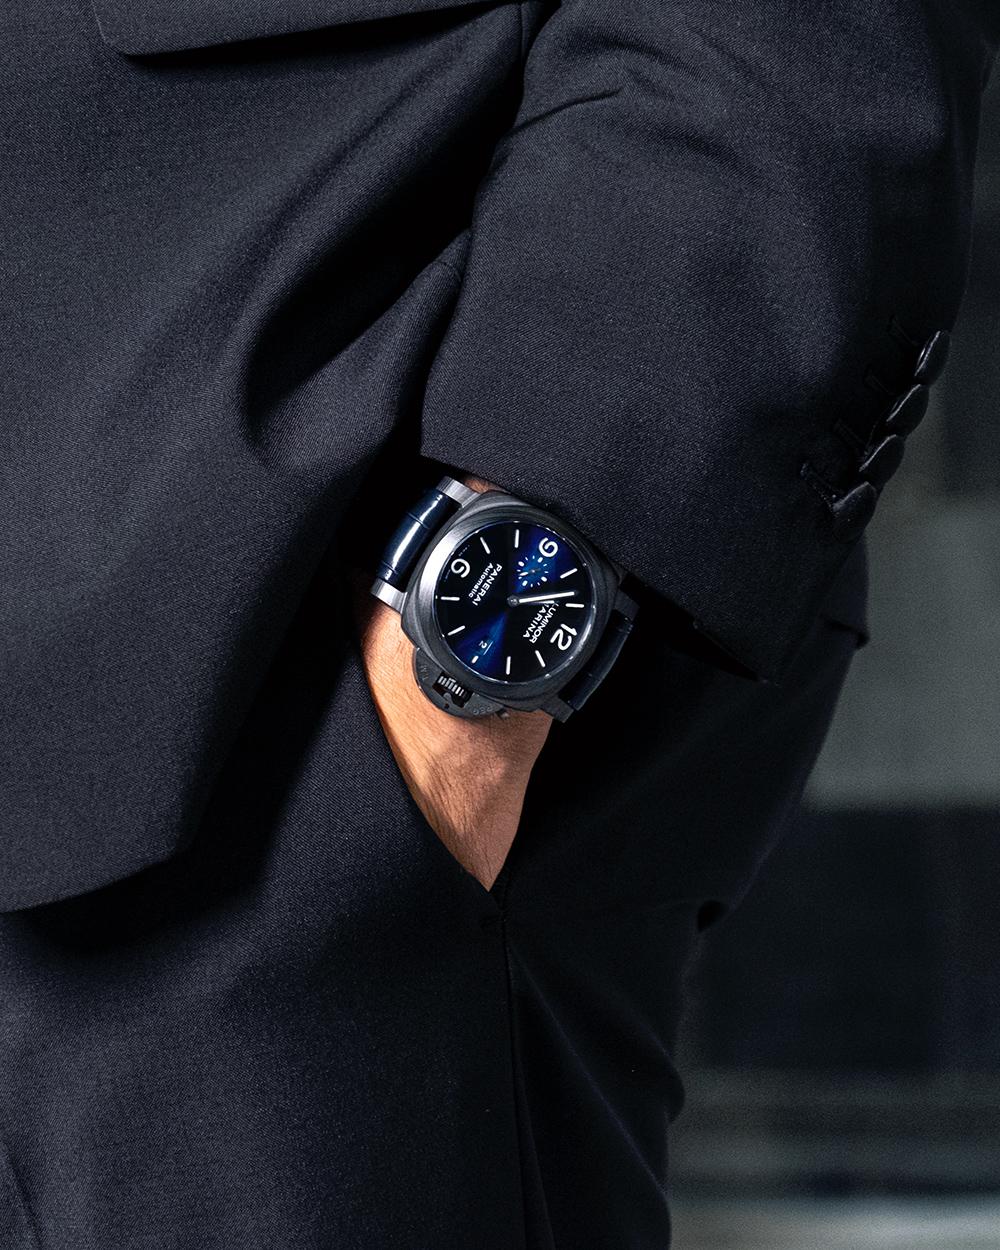 Carbotech Blu Notte